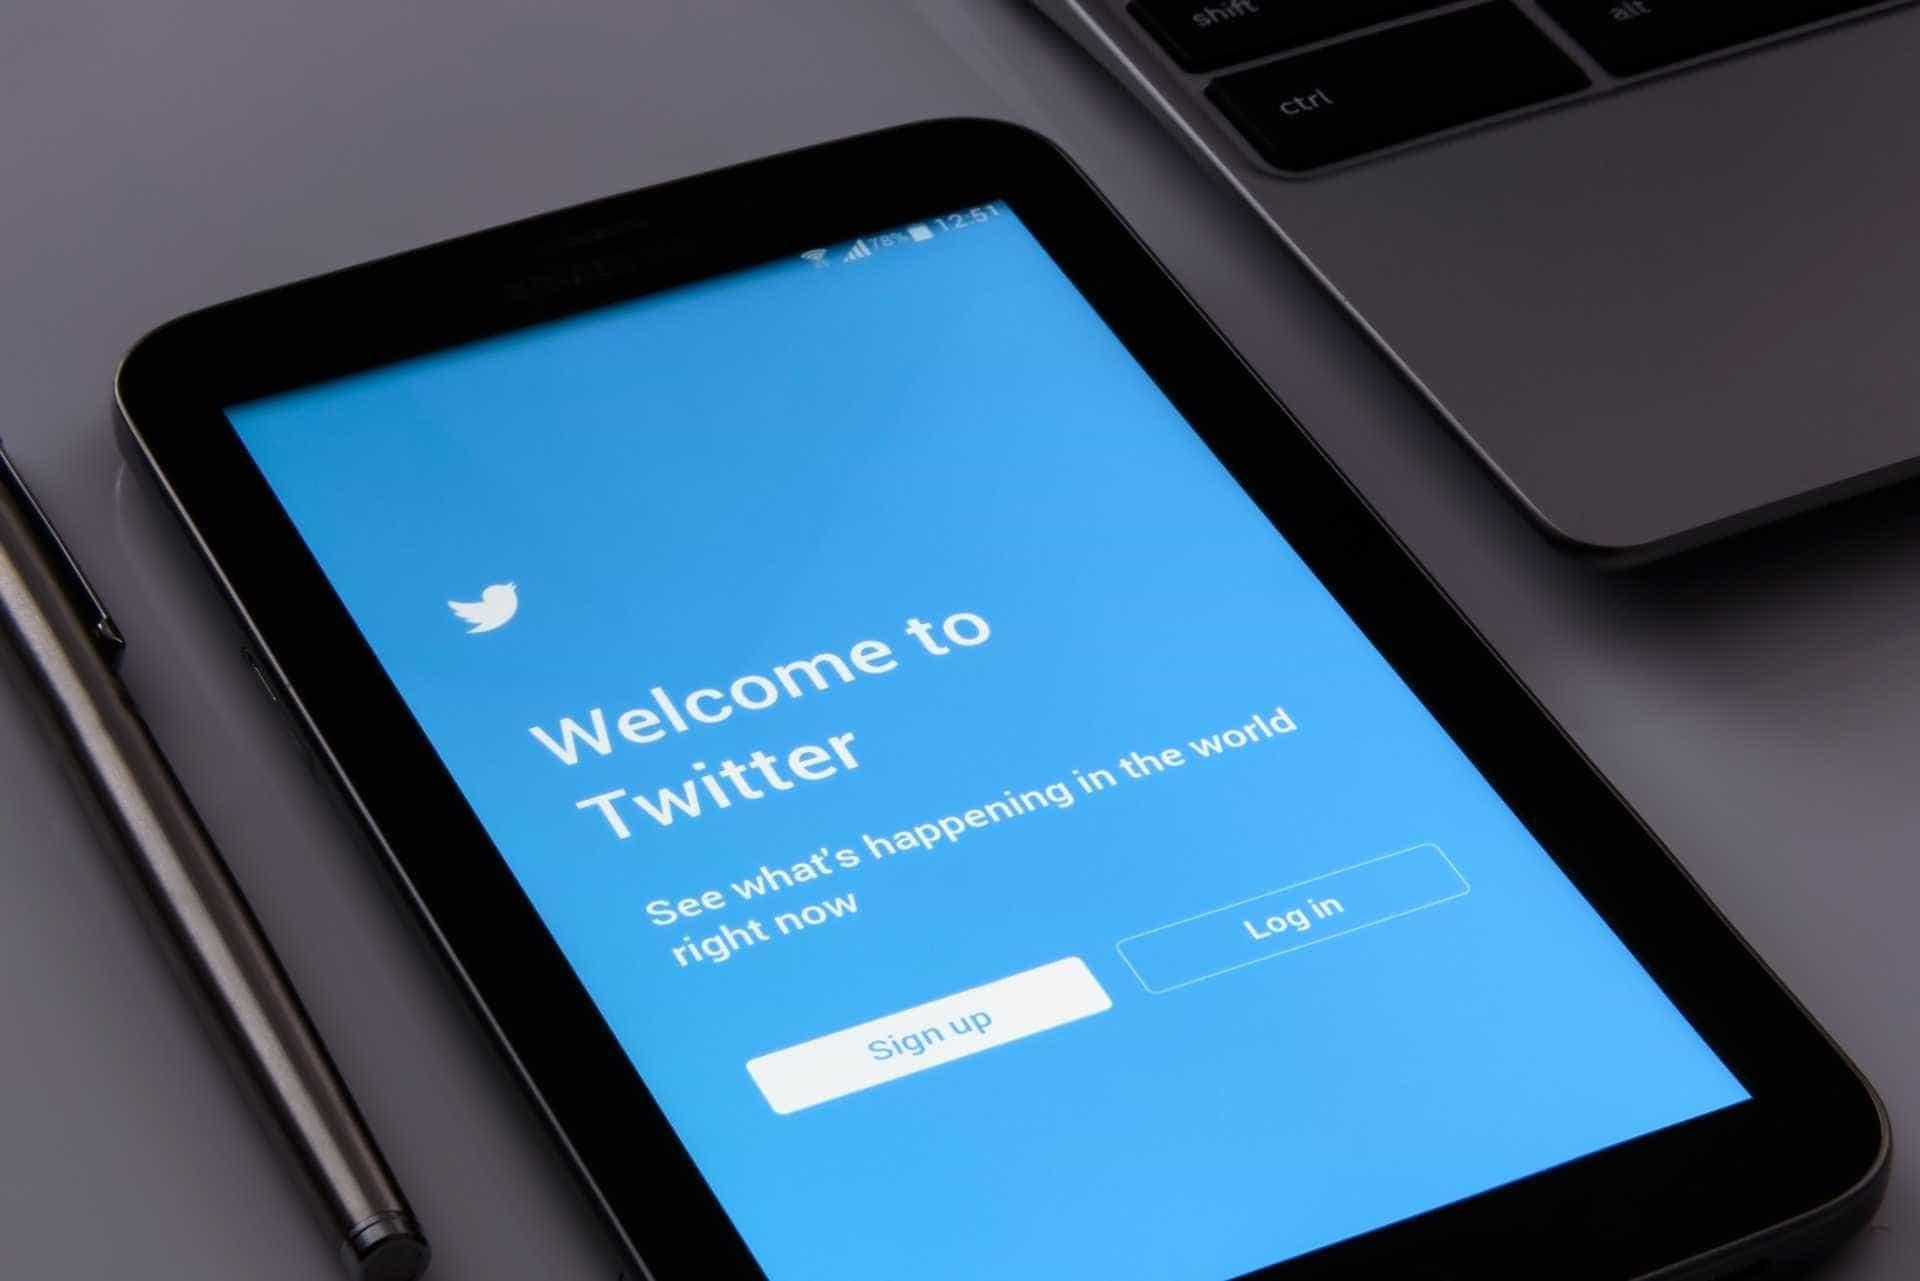 Crise envolvendo Bebianno pauta discussões no Twitter do Brasil